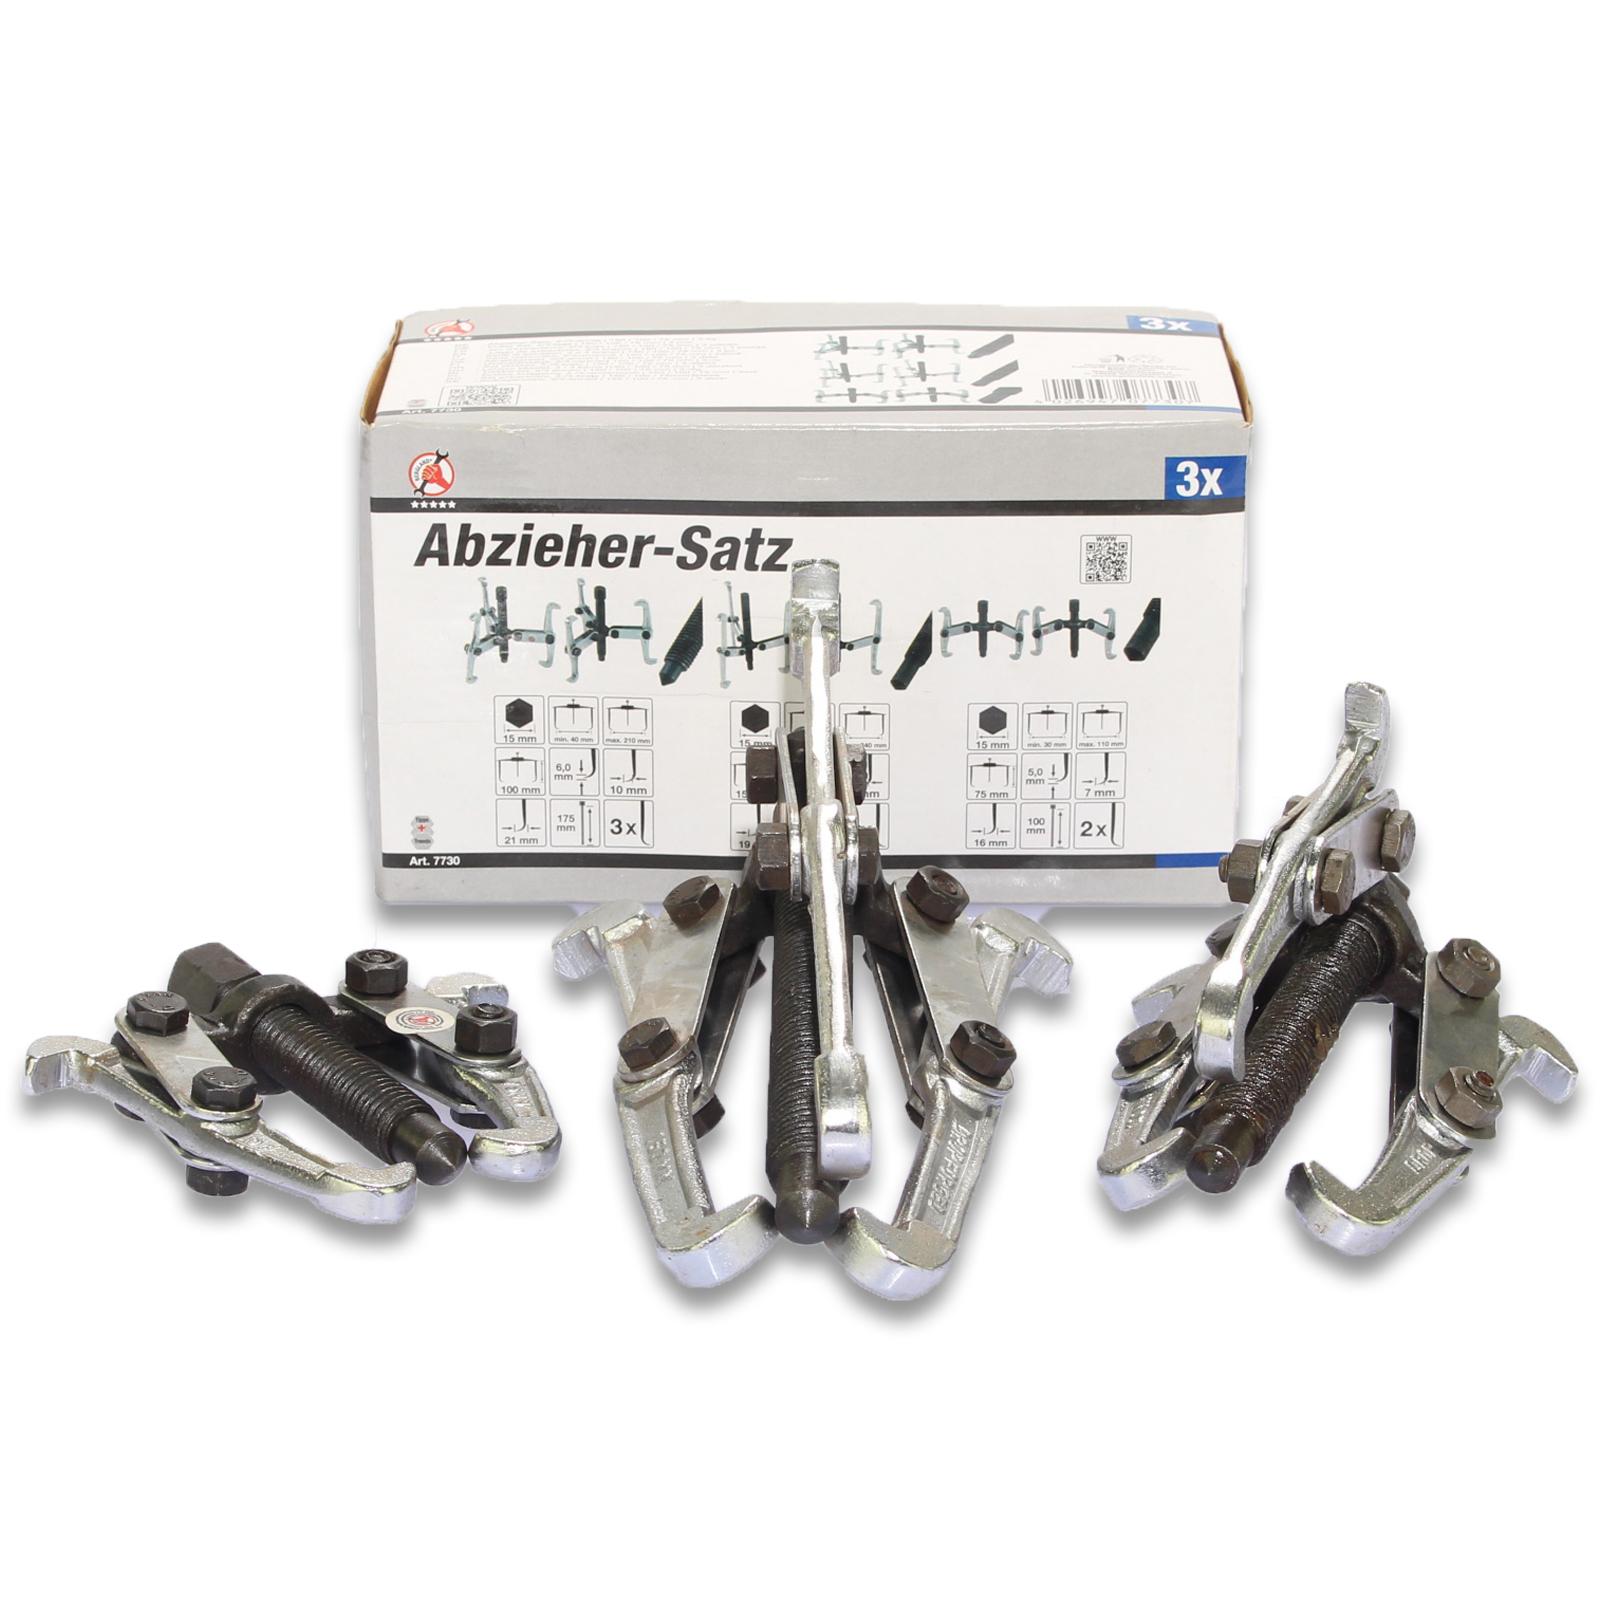 Abzieher-Satz, 2-/3-armig | 150 / 100 / 75 mm | 3-tlg.